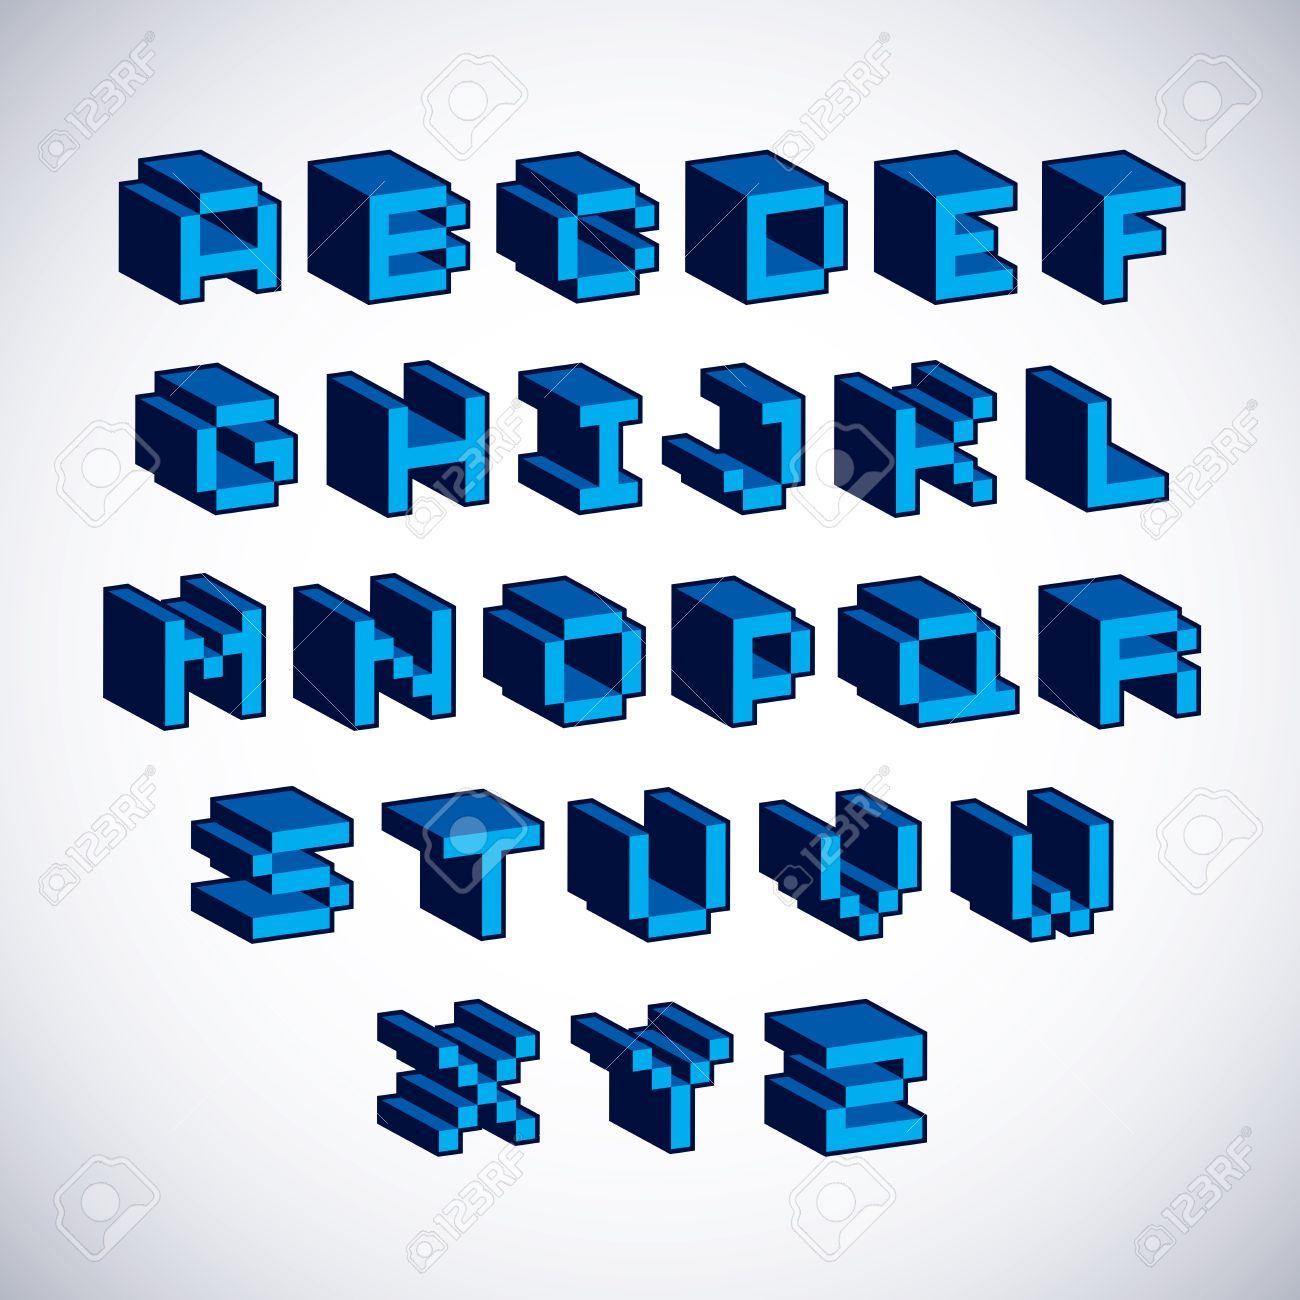 Cybernetic 3d Alphabet Letters, Pixel Art Vector Digital Typescript ...